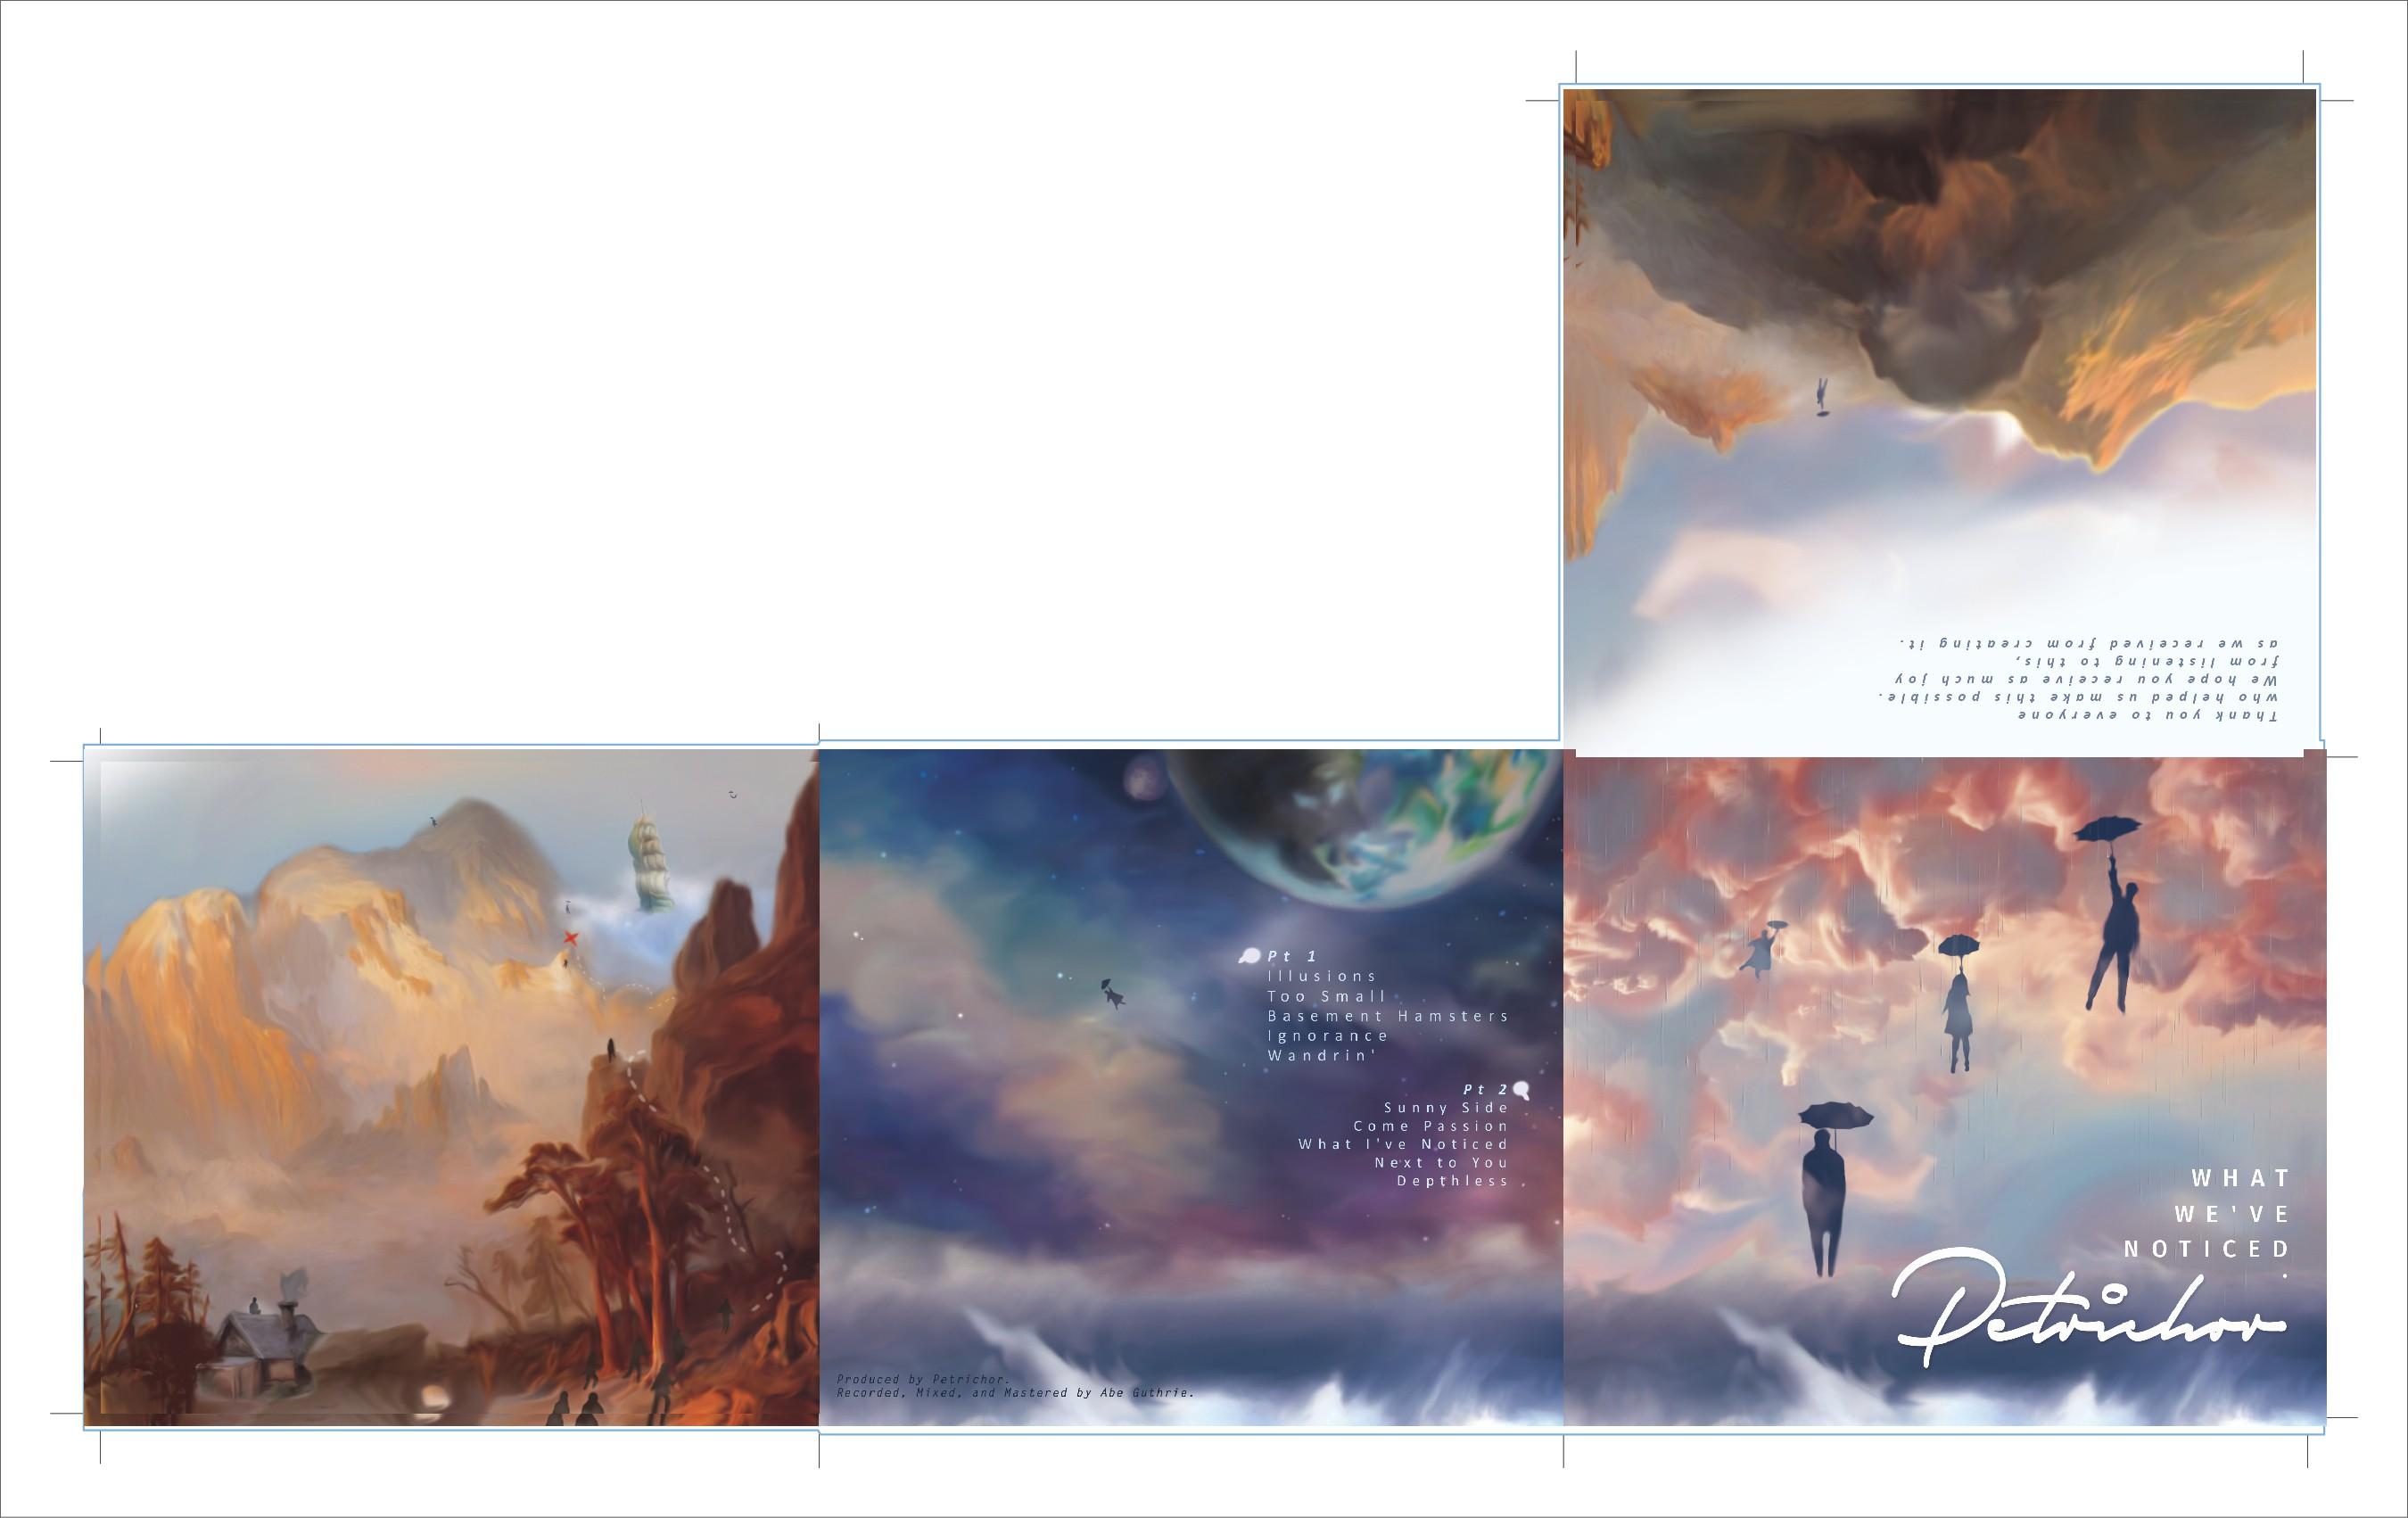 Help create the album artwork for Petrichor's debut album!